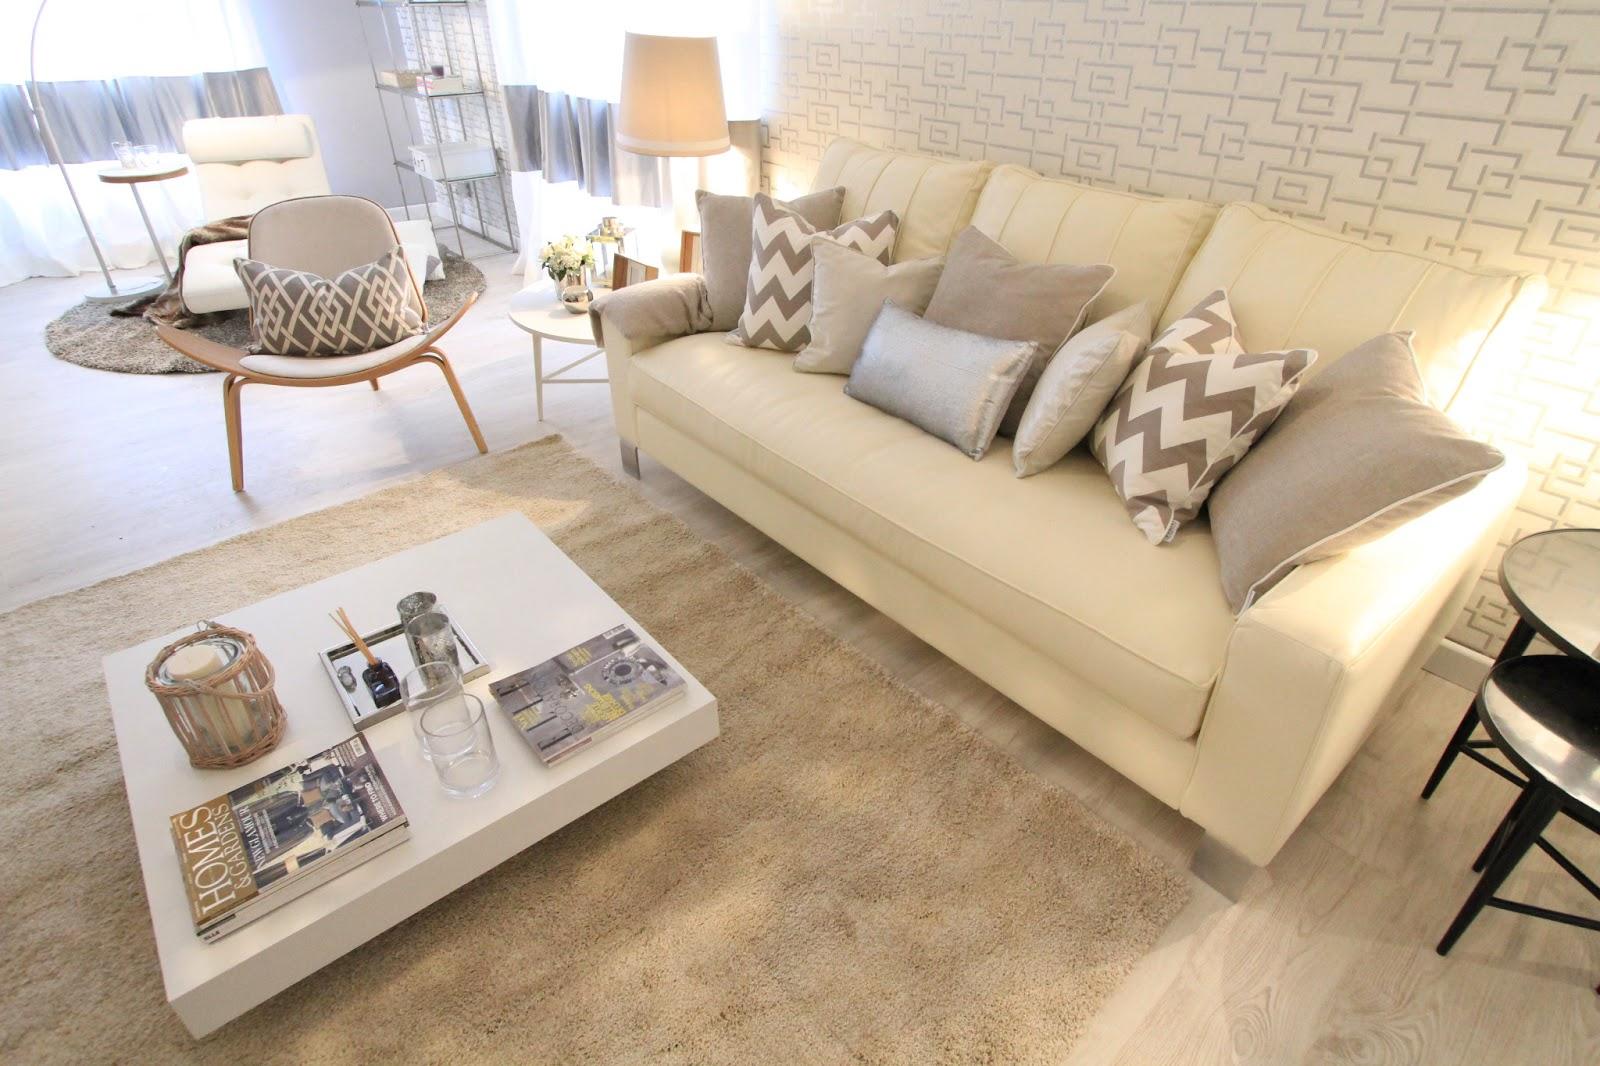 soalho leroy merlin tapete ikea mesas de apoio laterais sofá #886C43 1600x1066